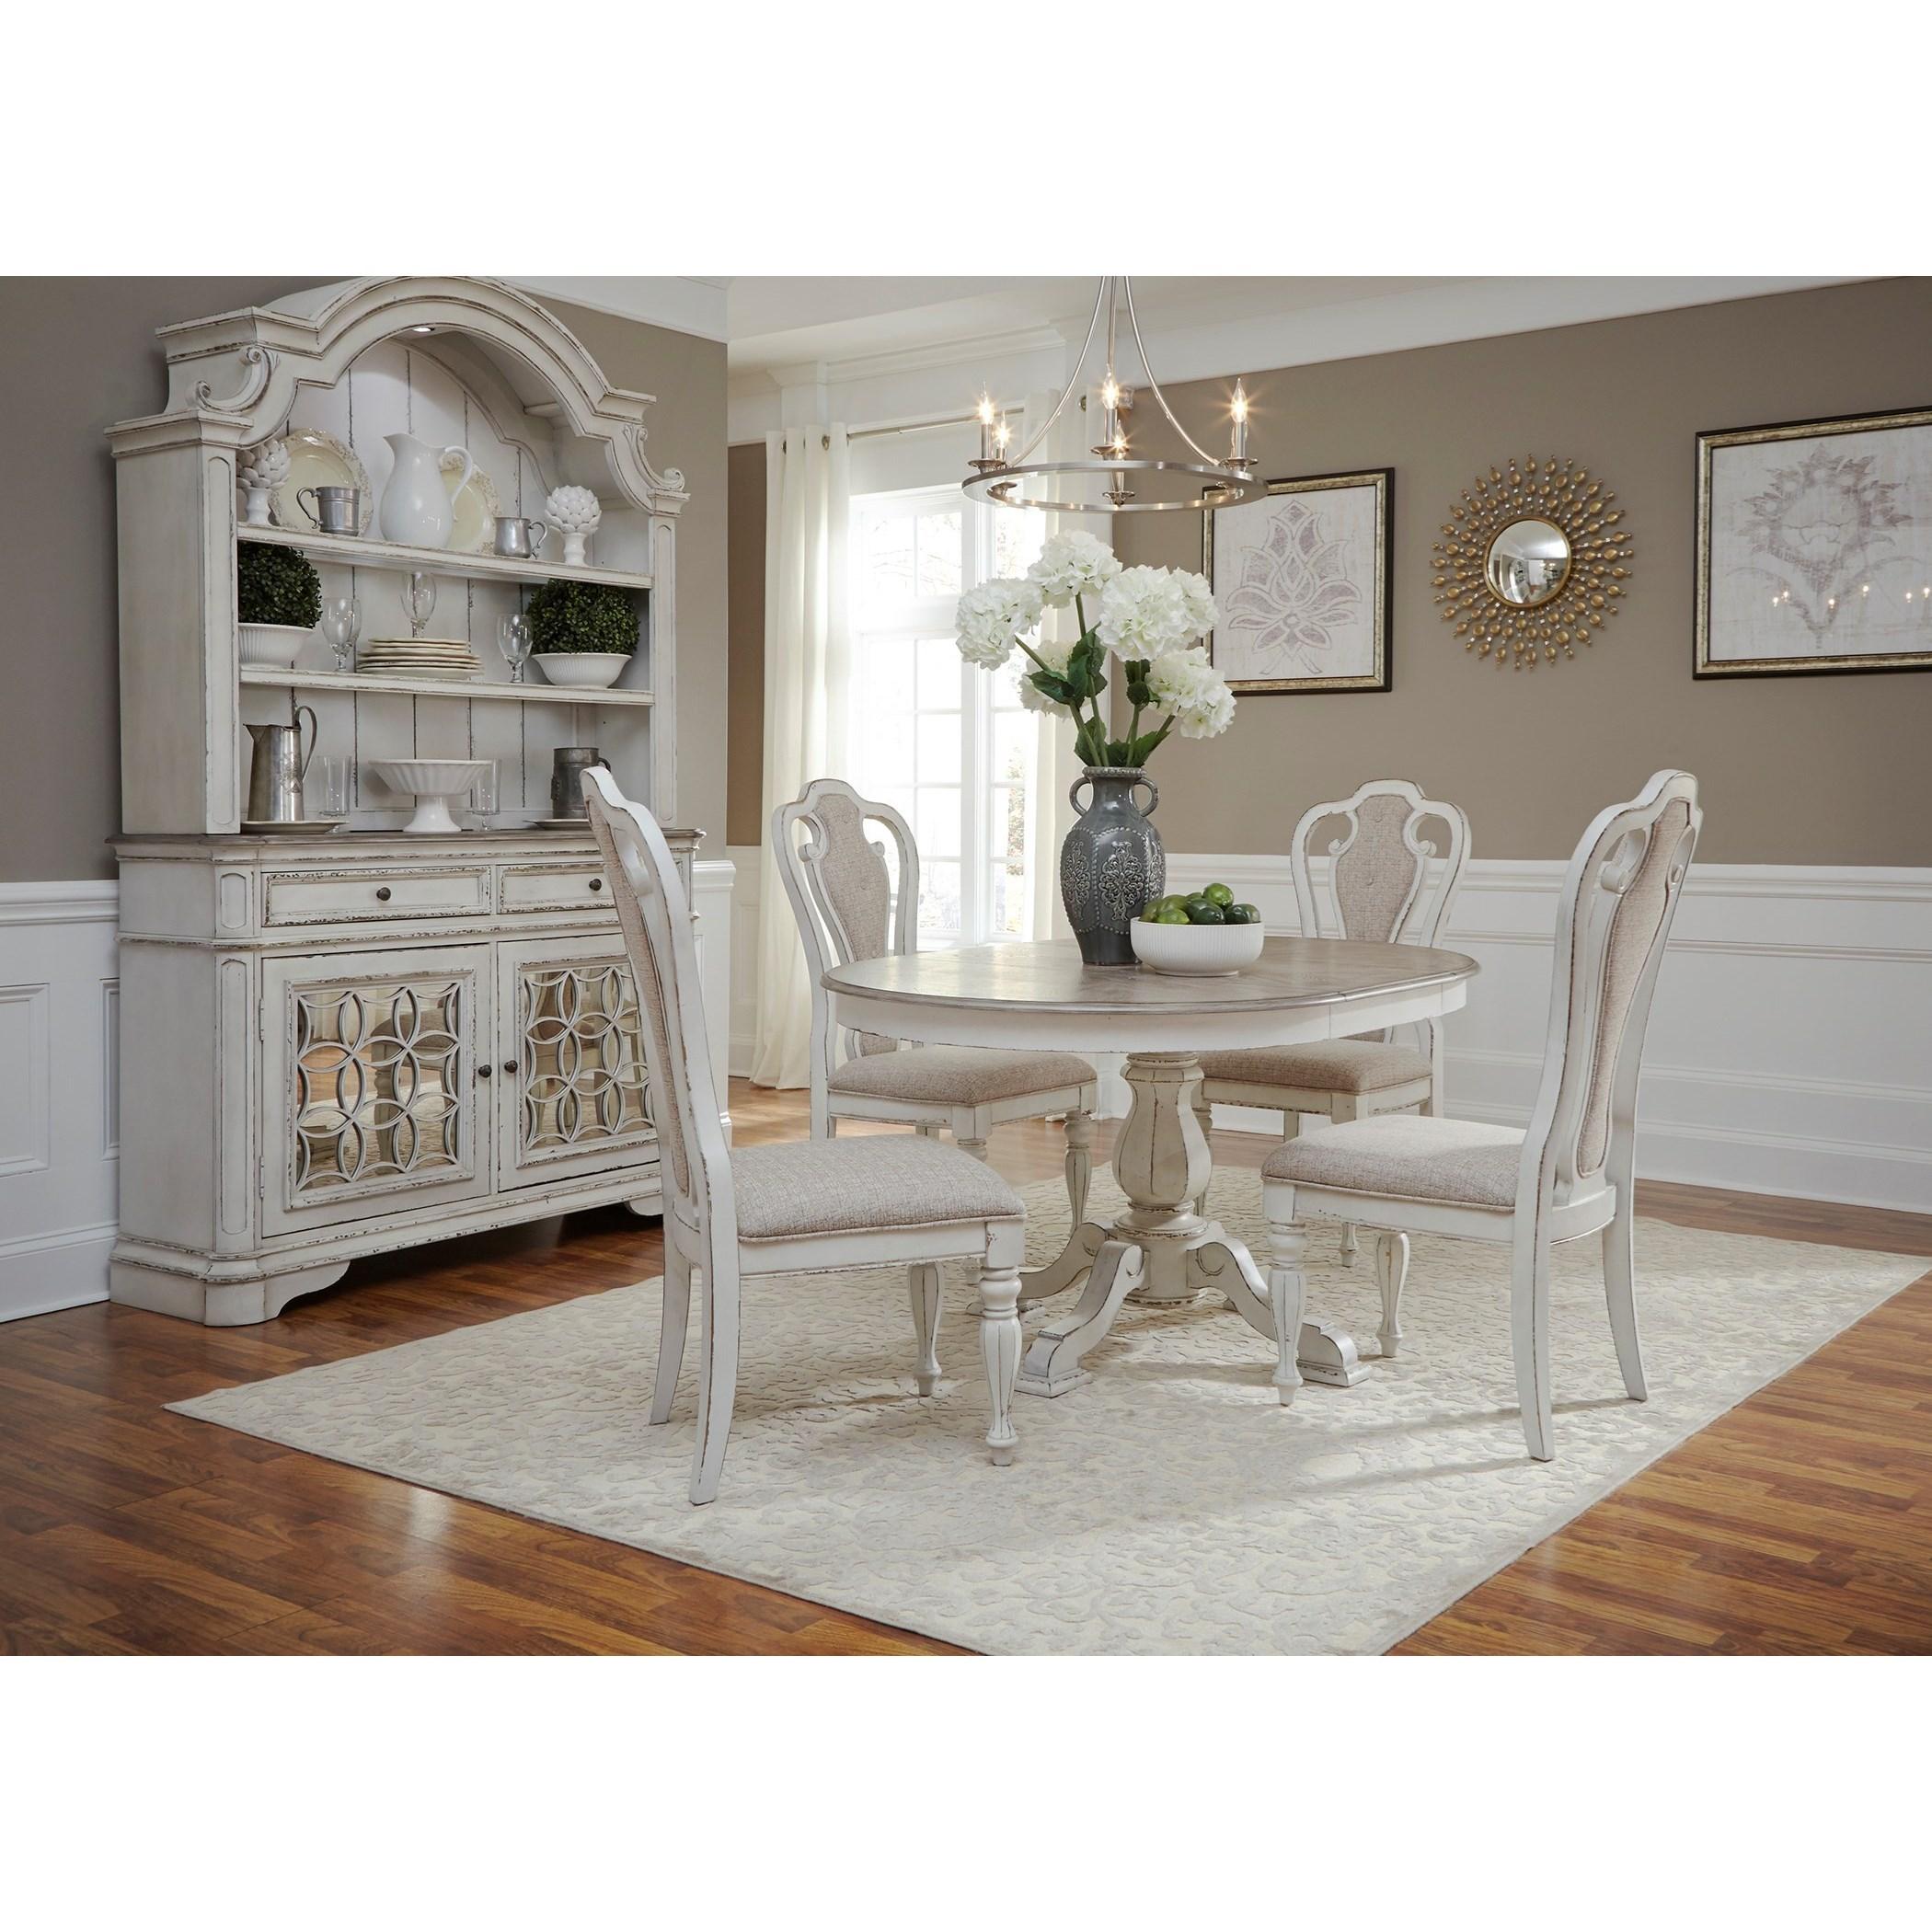 ... Liberty Furniture Magnolia Manor5 Piece Table Set